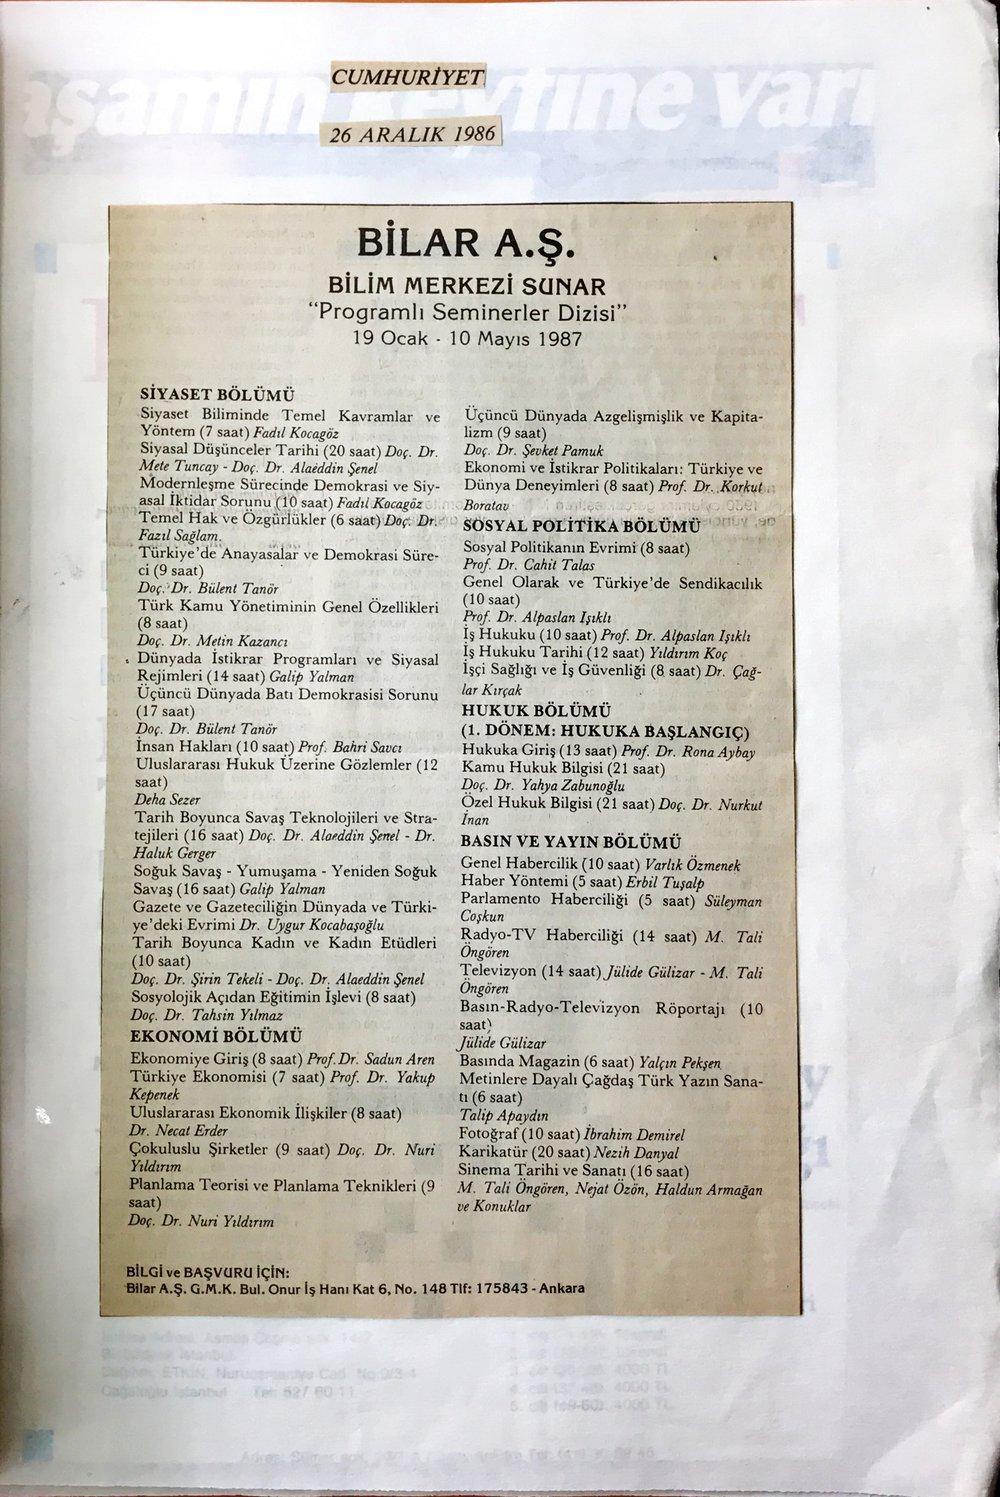 1986_cumhuriyet_bilar-ders-ilani.JPG